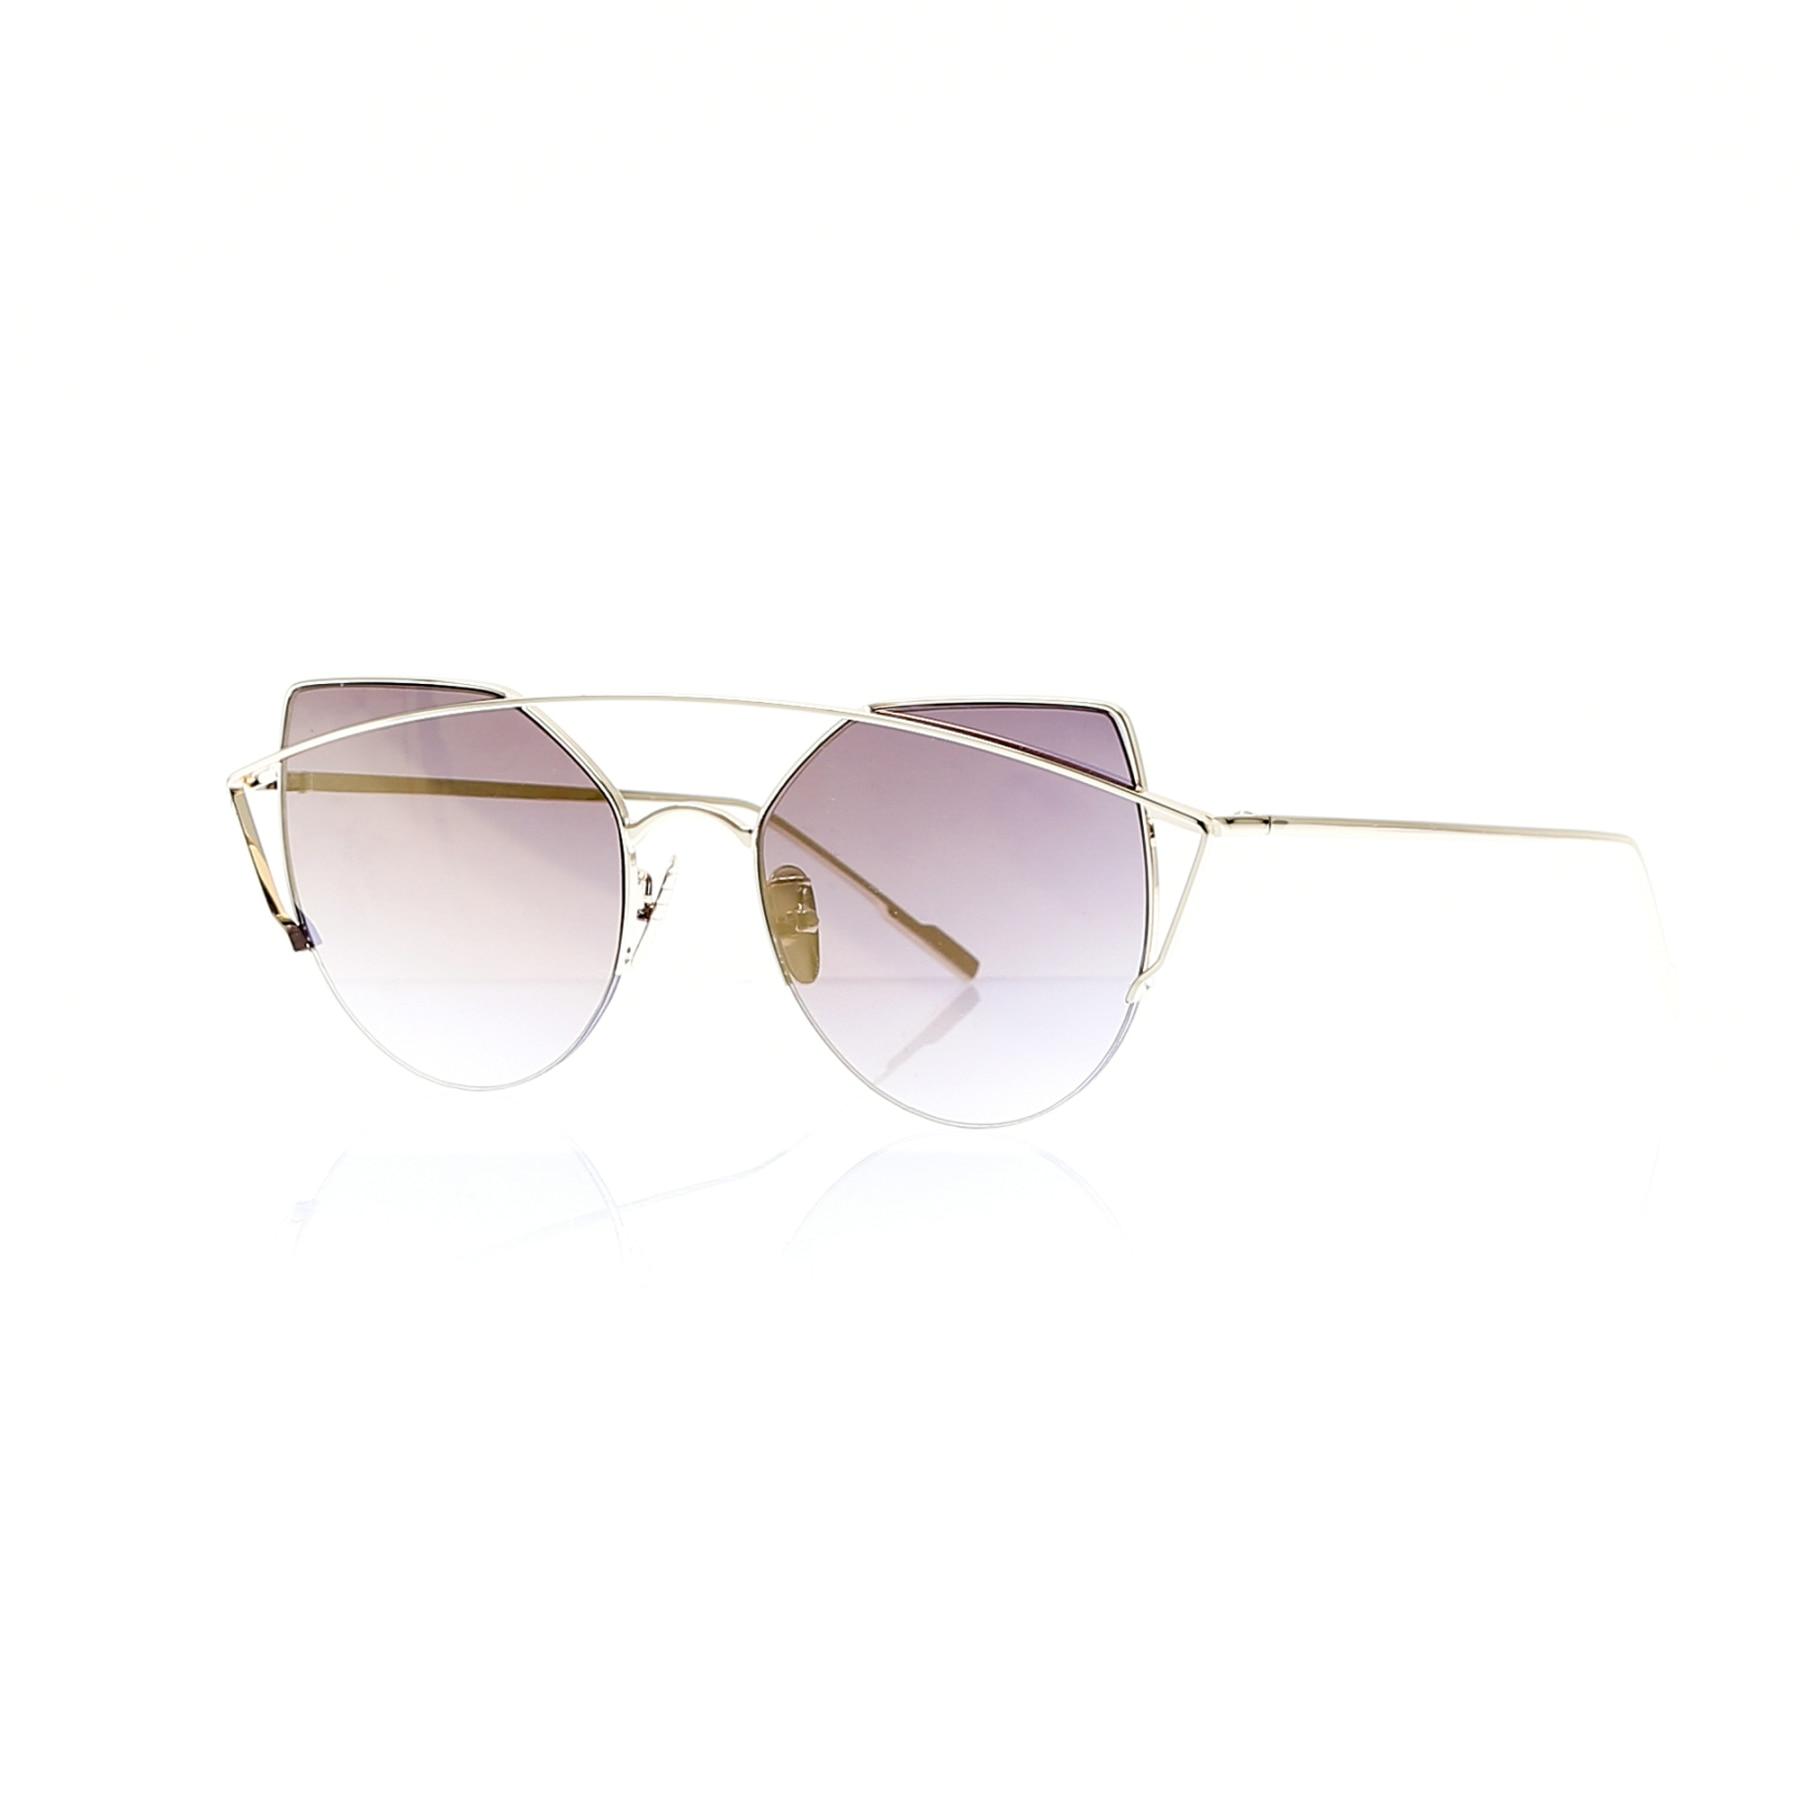 Women's sunglasses ldy 1937 52 metal yellow organic half frame aval 56-18-140 lady victoria